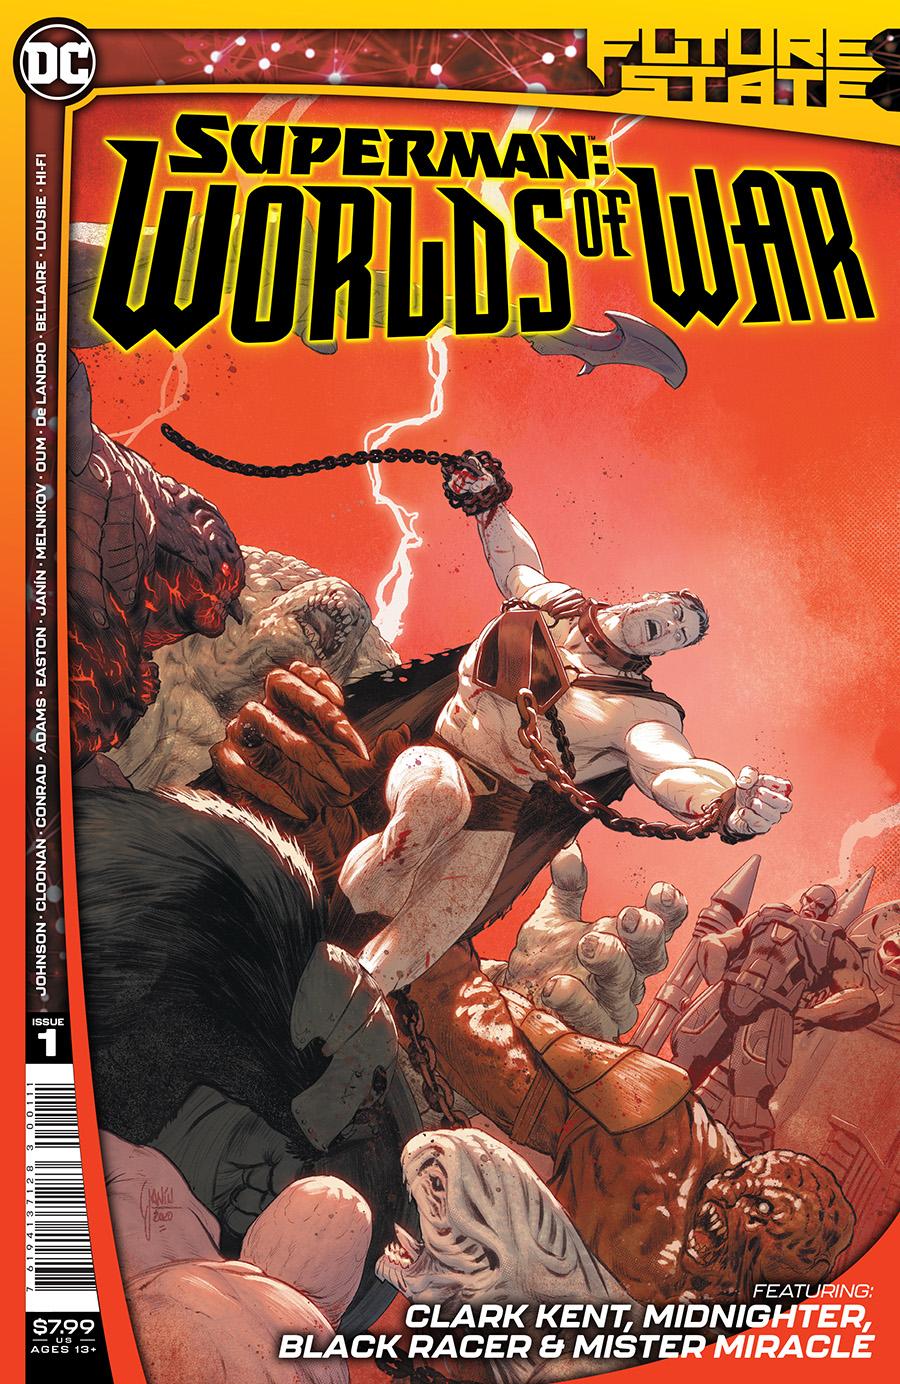 Future State: Superman - Worlds of War #1